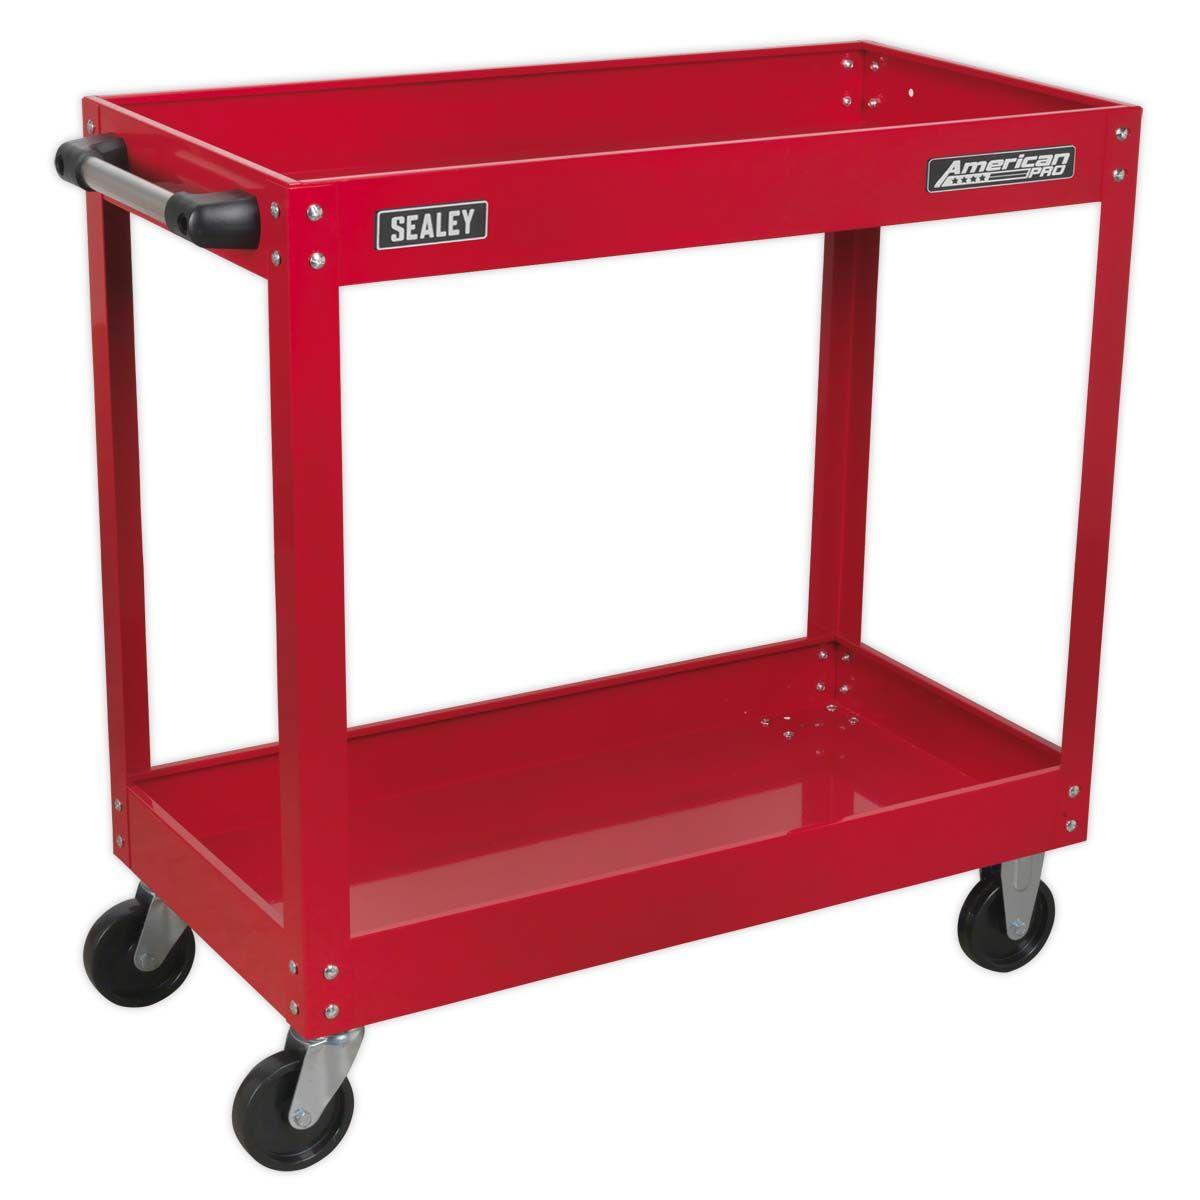 Sealey Workshop Trolley 2-Level Heavy-Duty